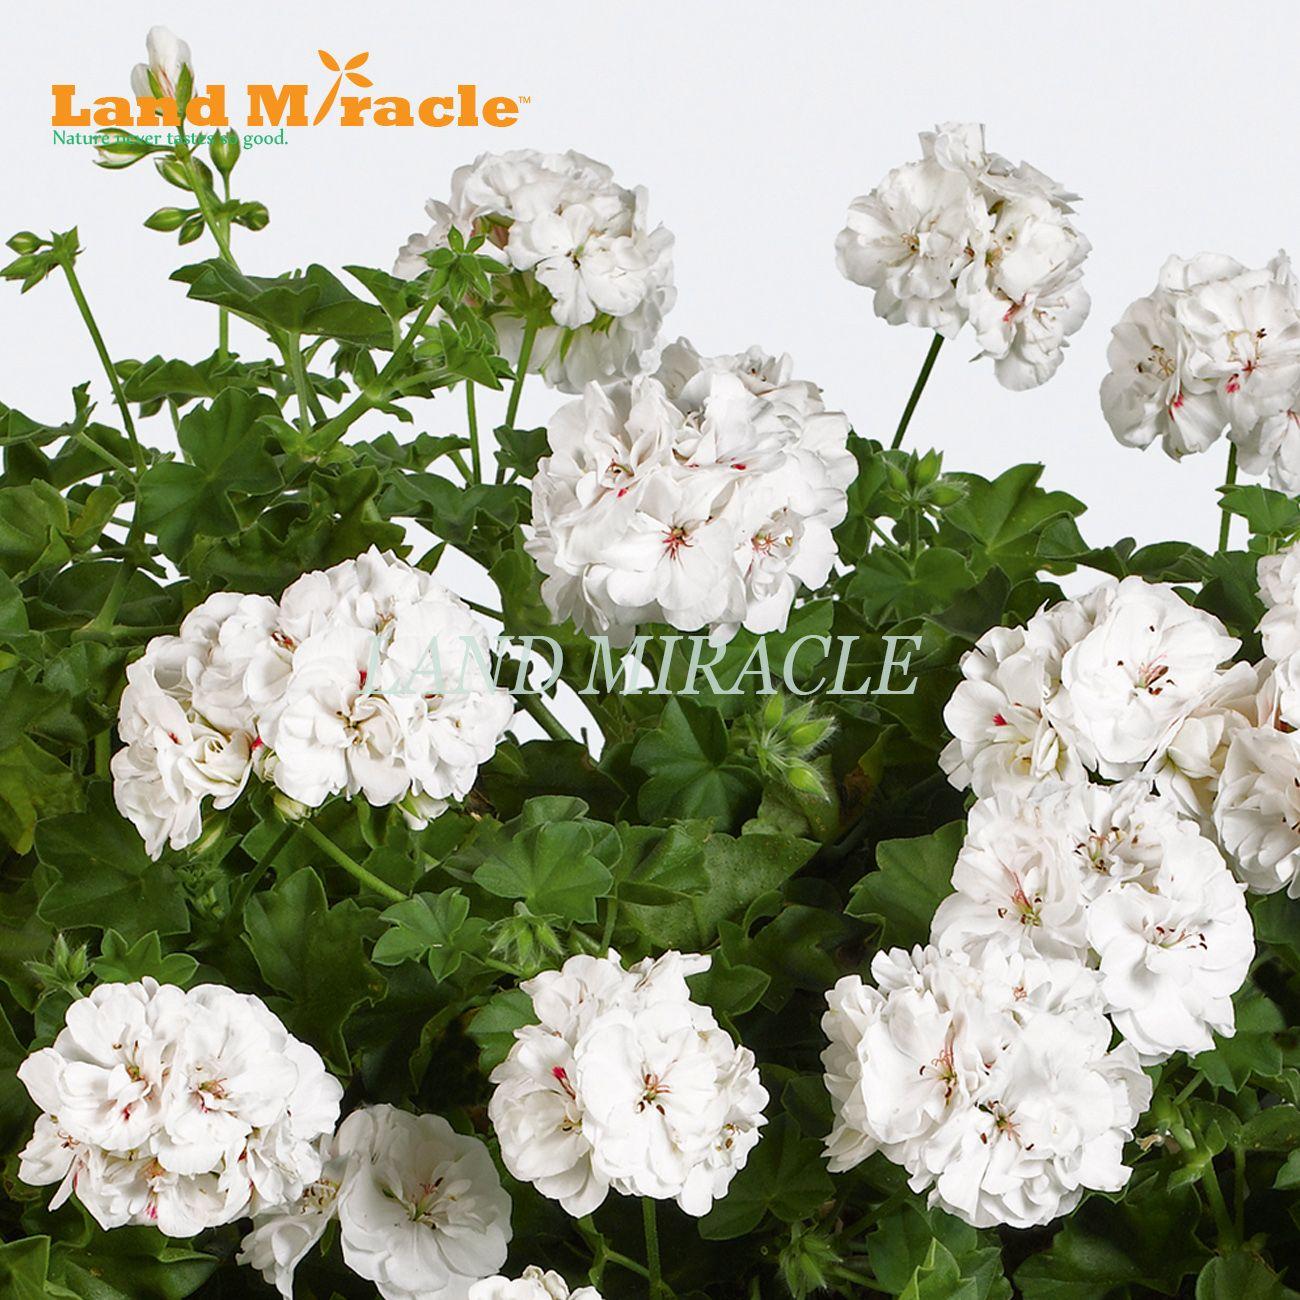 White Appleblossom Geranium Perennial Flower Seeds, 5 Seeds, Rare Big-blooms Pelargonium Hortorum For Garden Plant